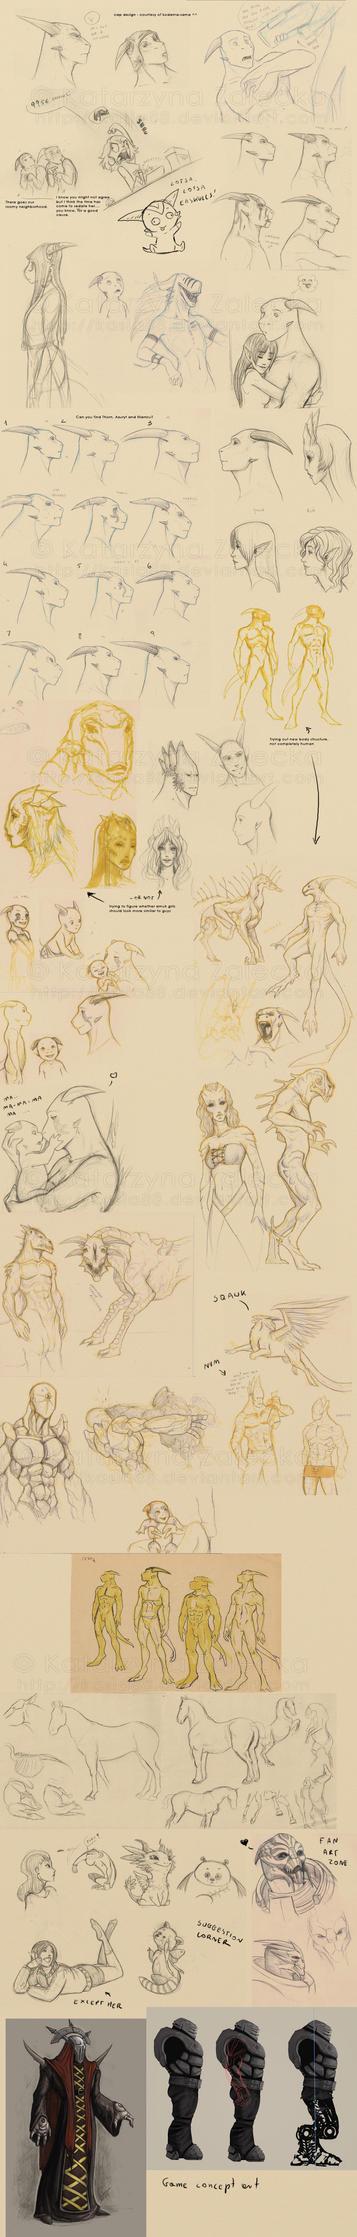 august 09 sketchdump by Sythgara